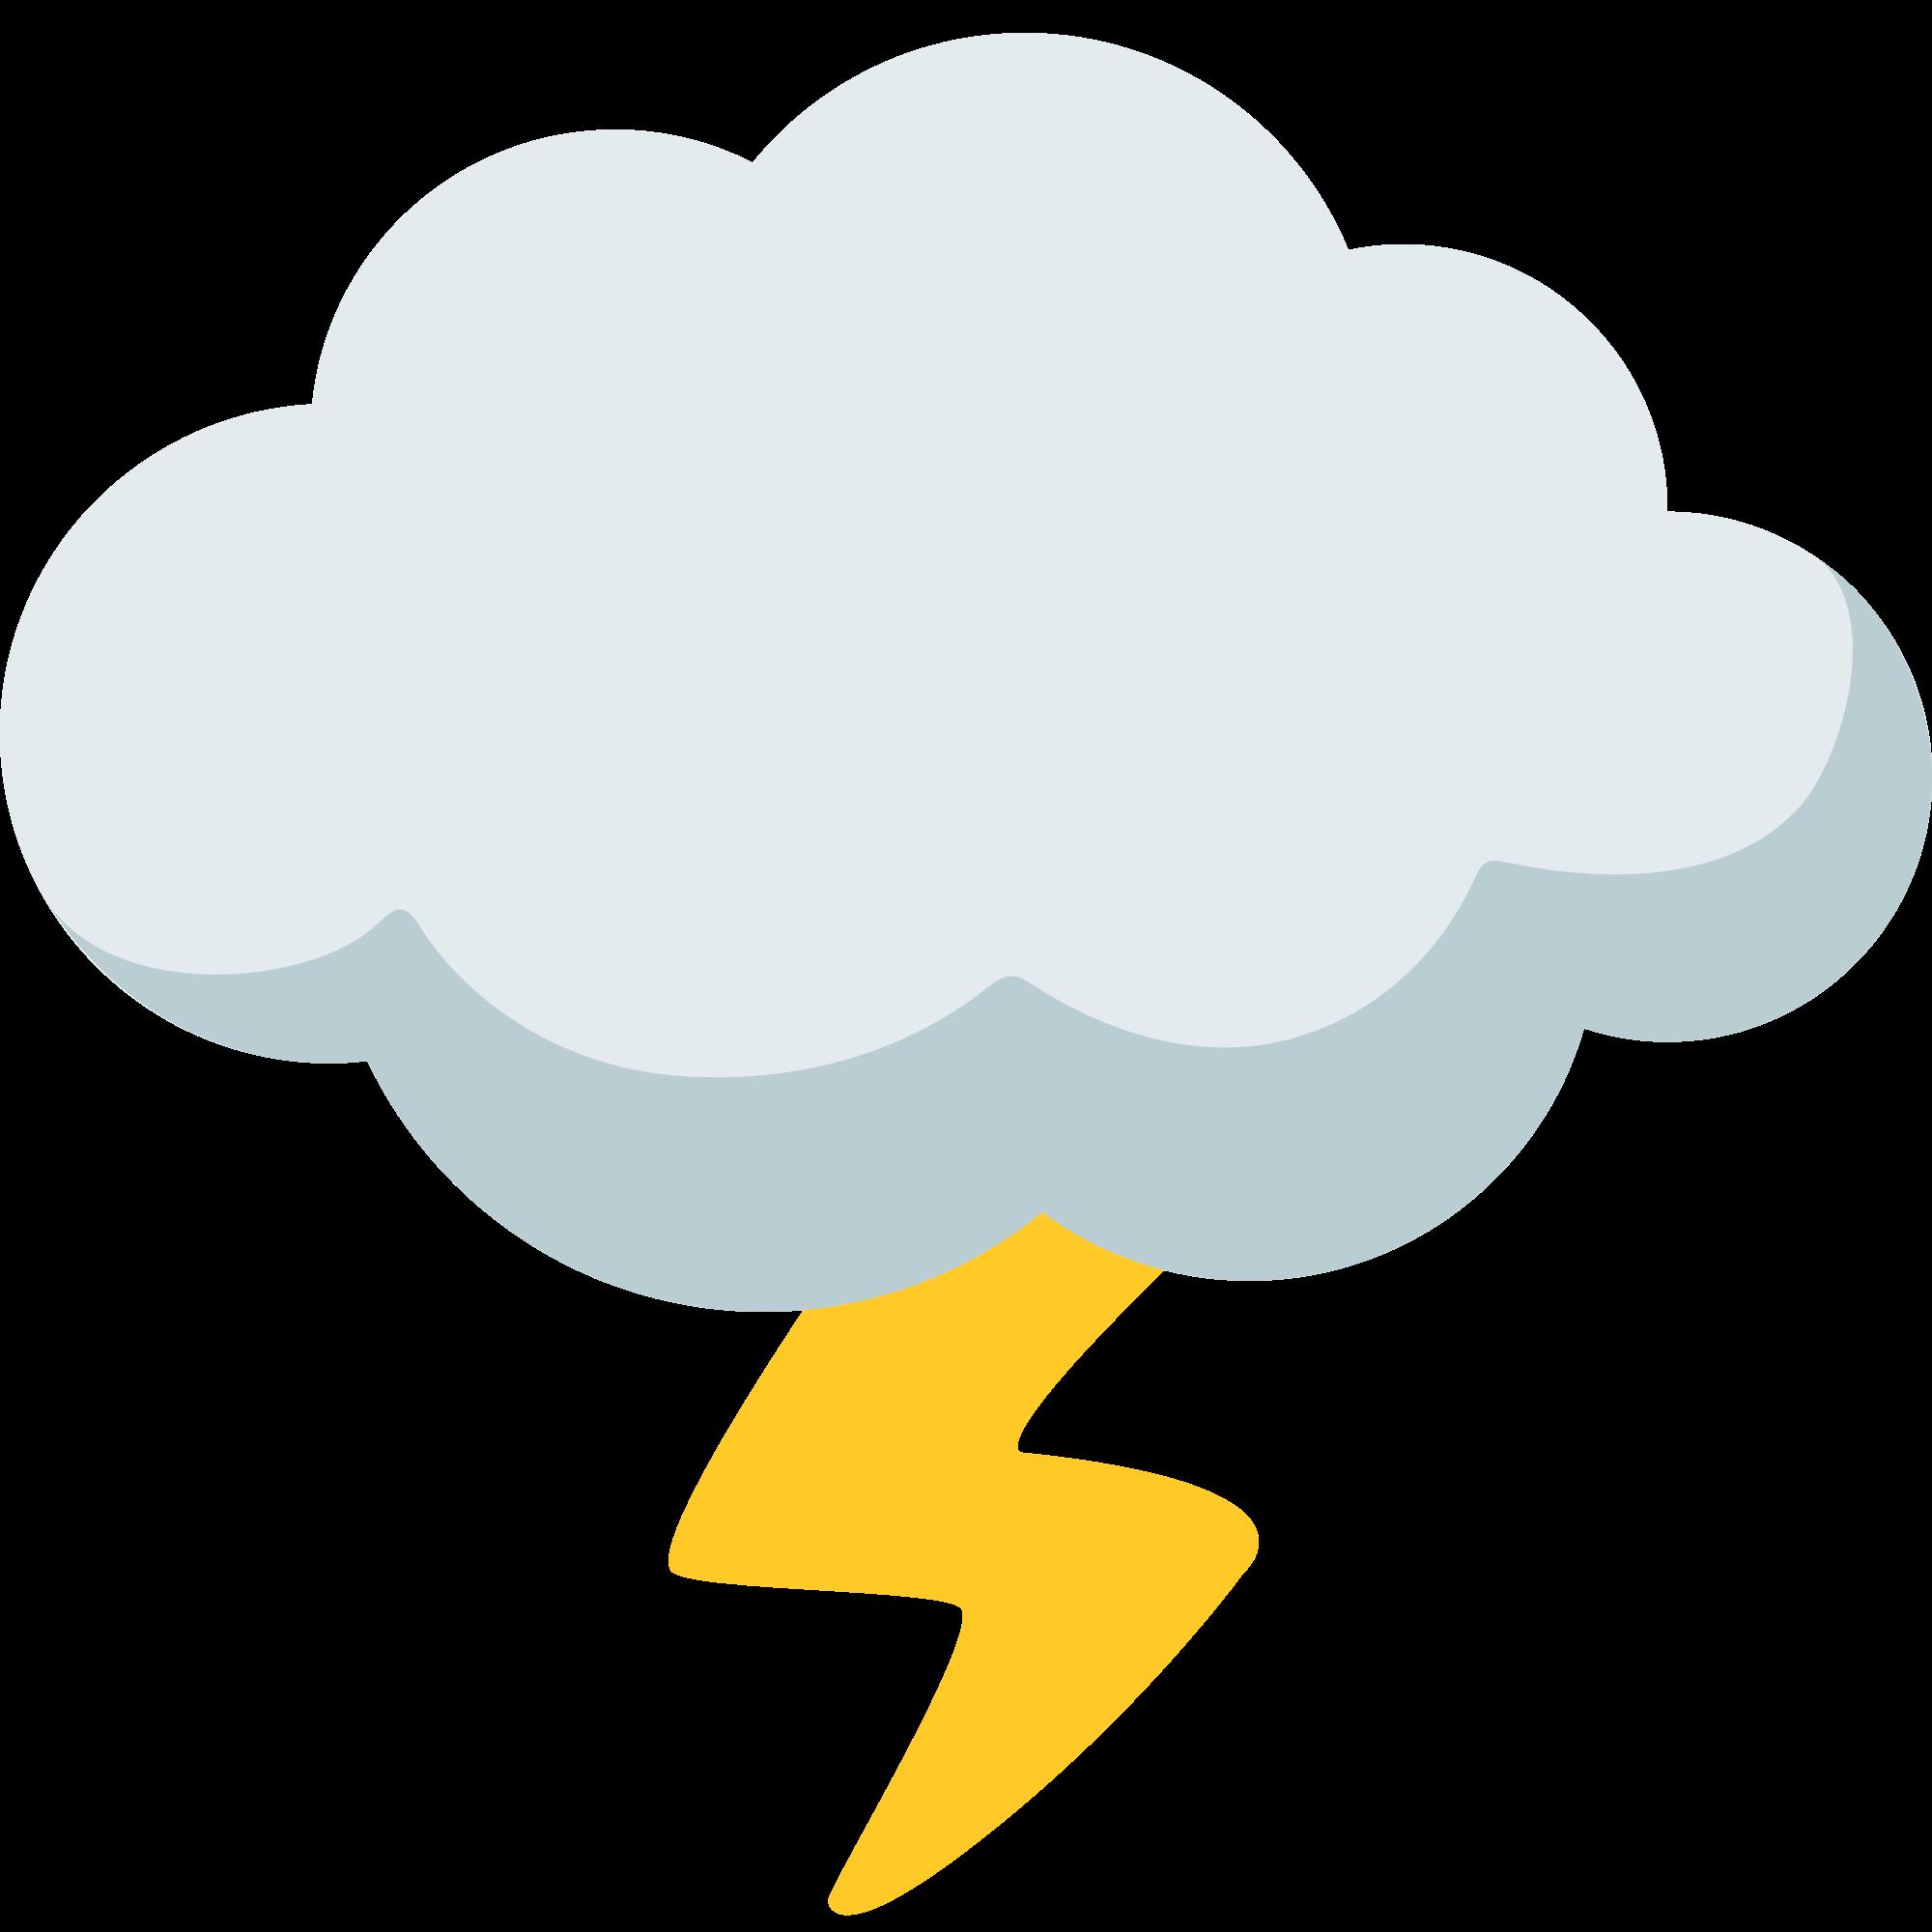 File u f svg. Lightning clipart emoji